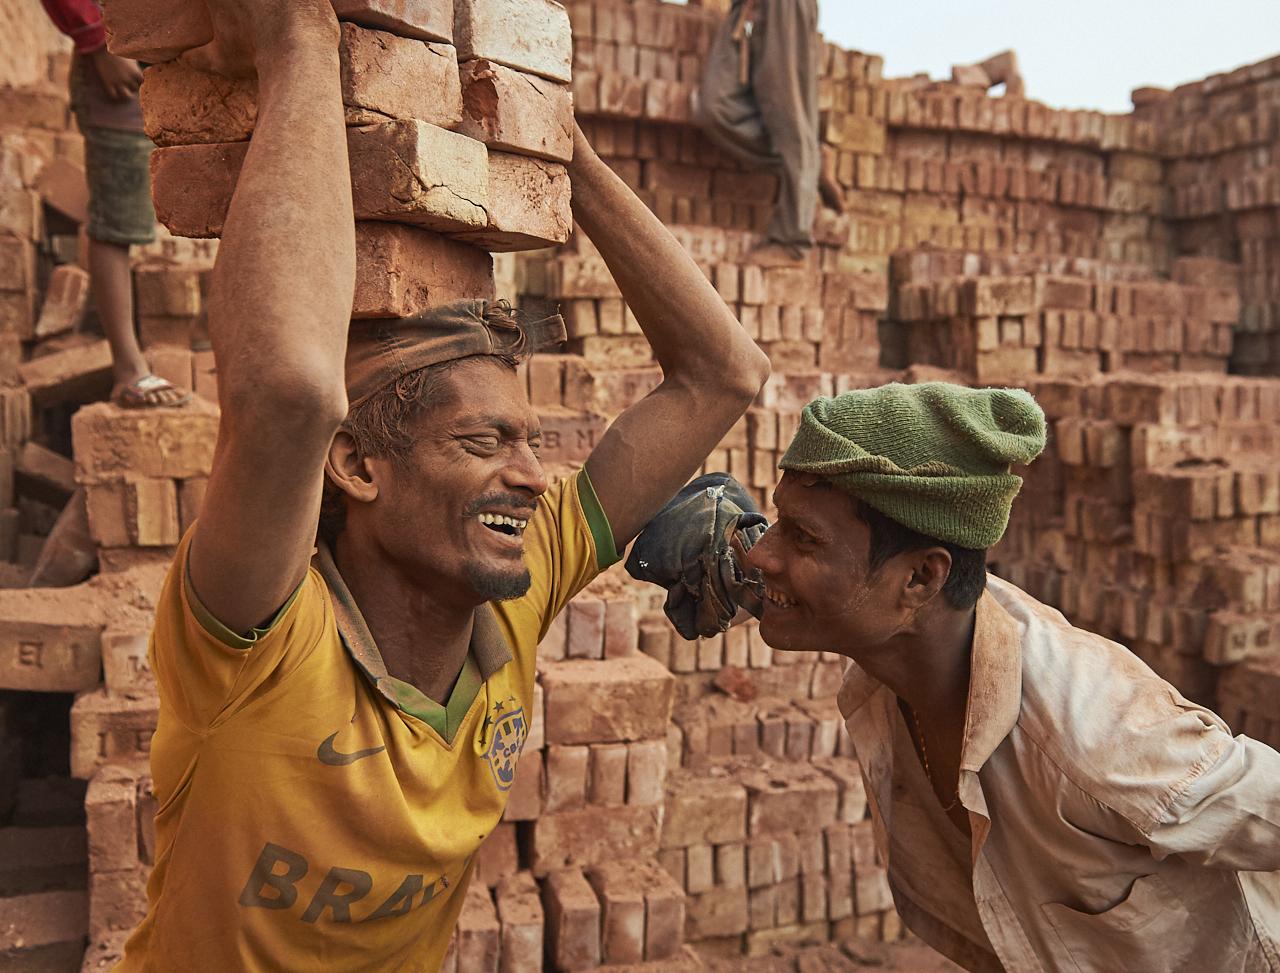 Brick factory workers, Dhaka